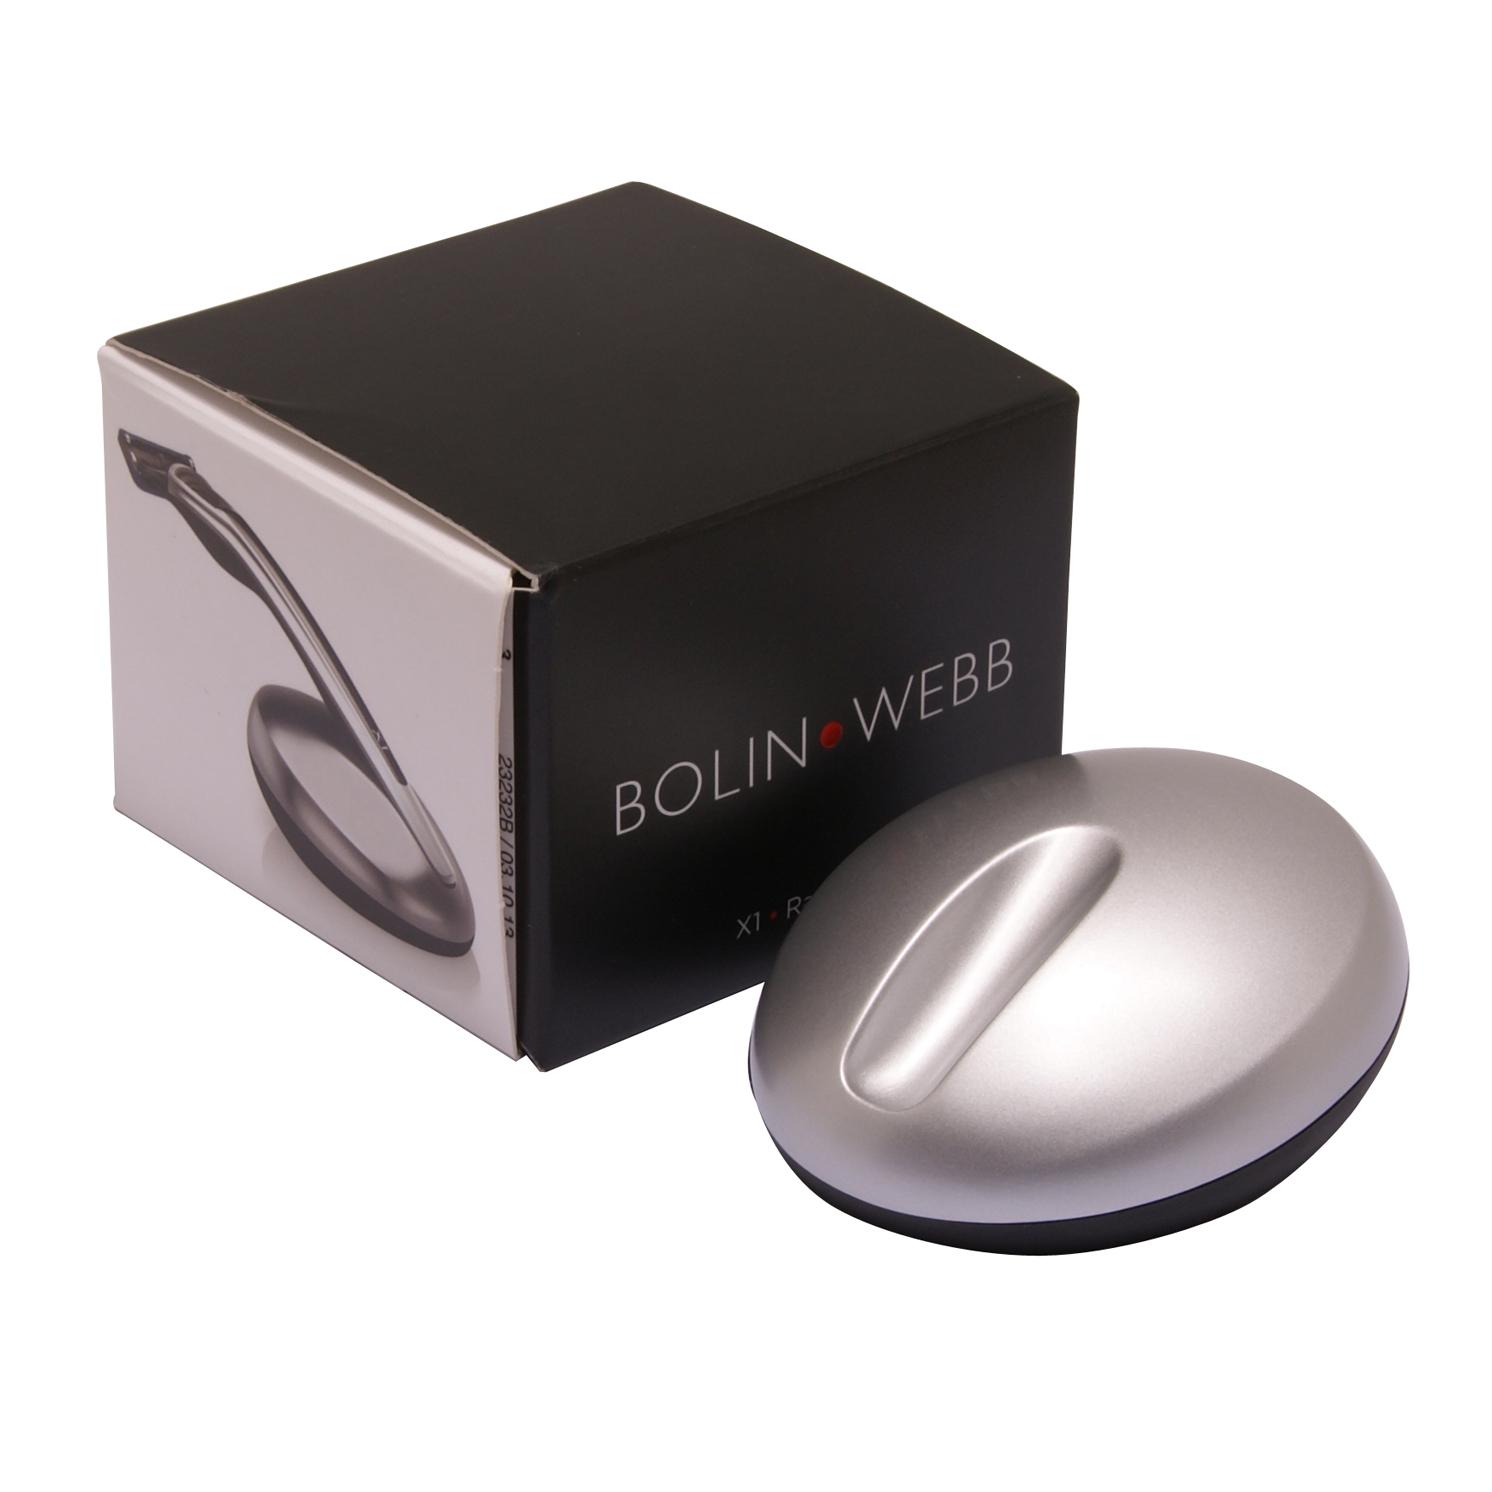 Bolin Webb – X1 Razor Stand